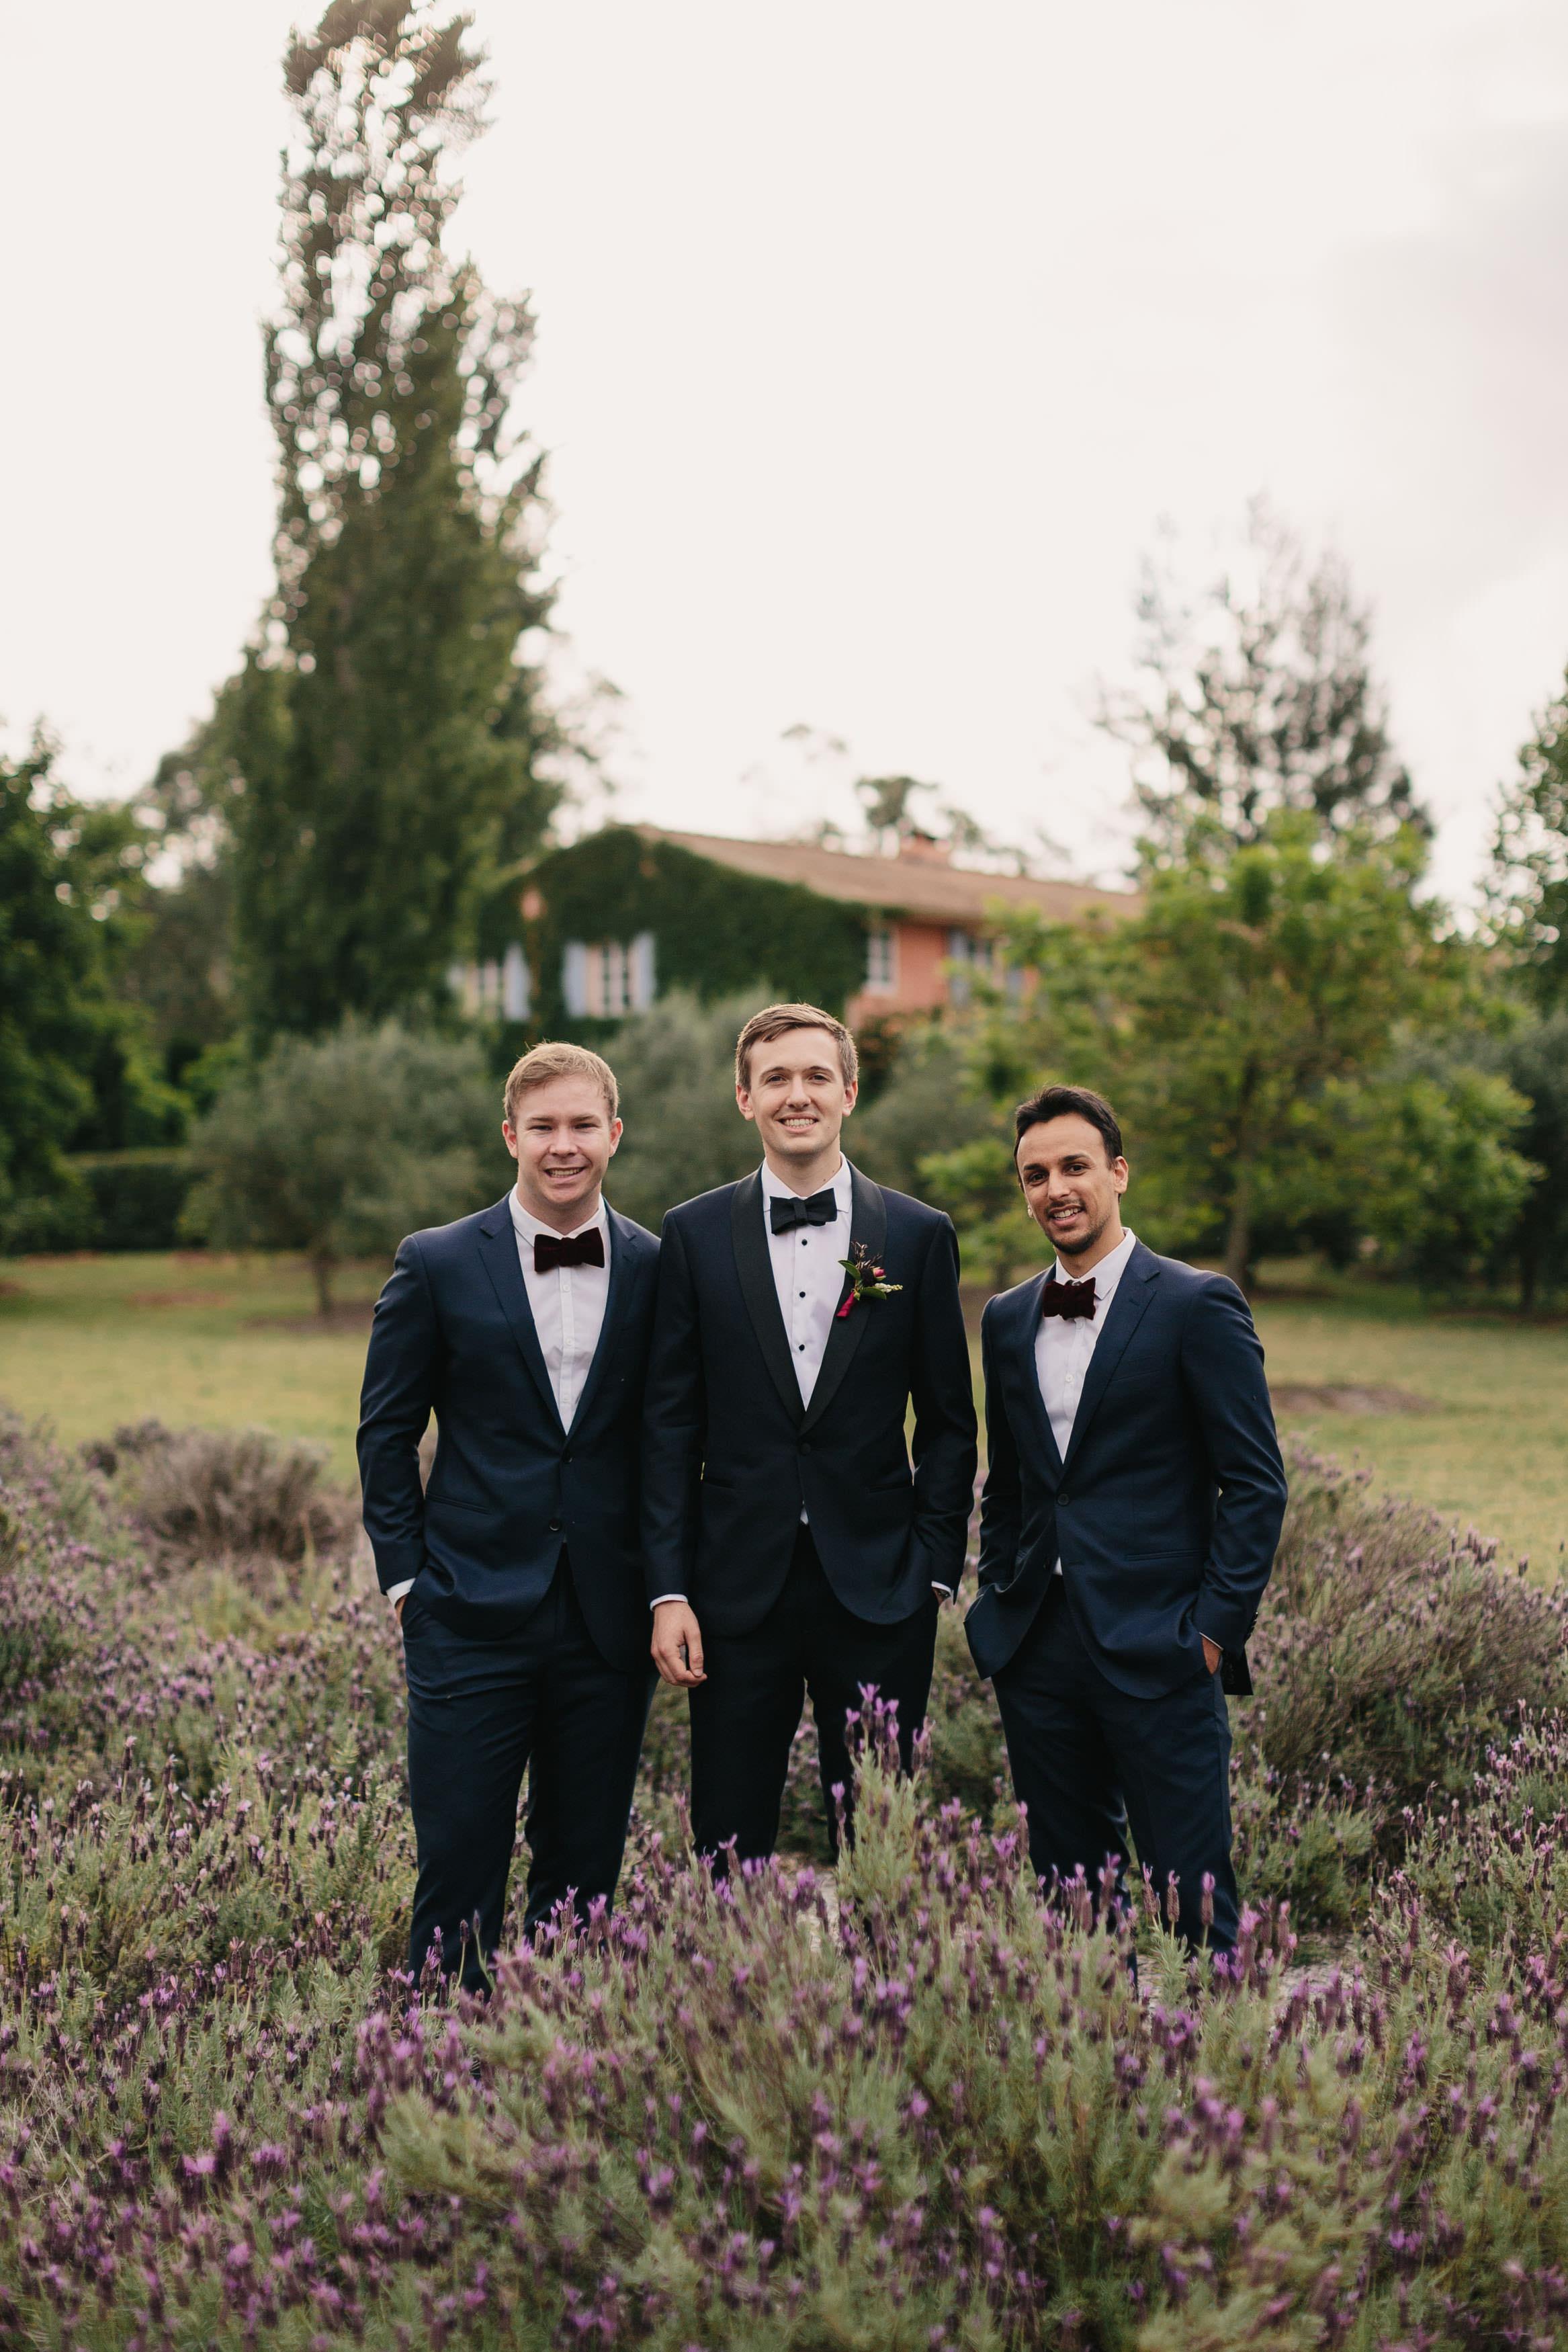 066_hunter_valley_wedding_photography_redleaf_paul_bamford_finchandoak.jpg